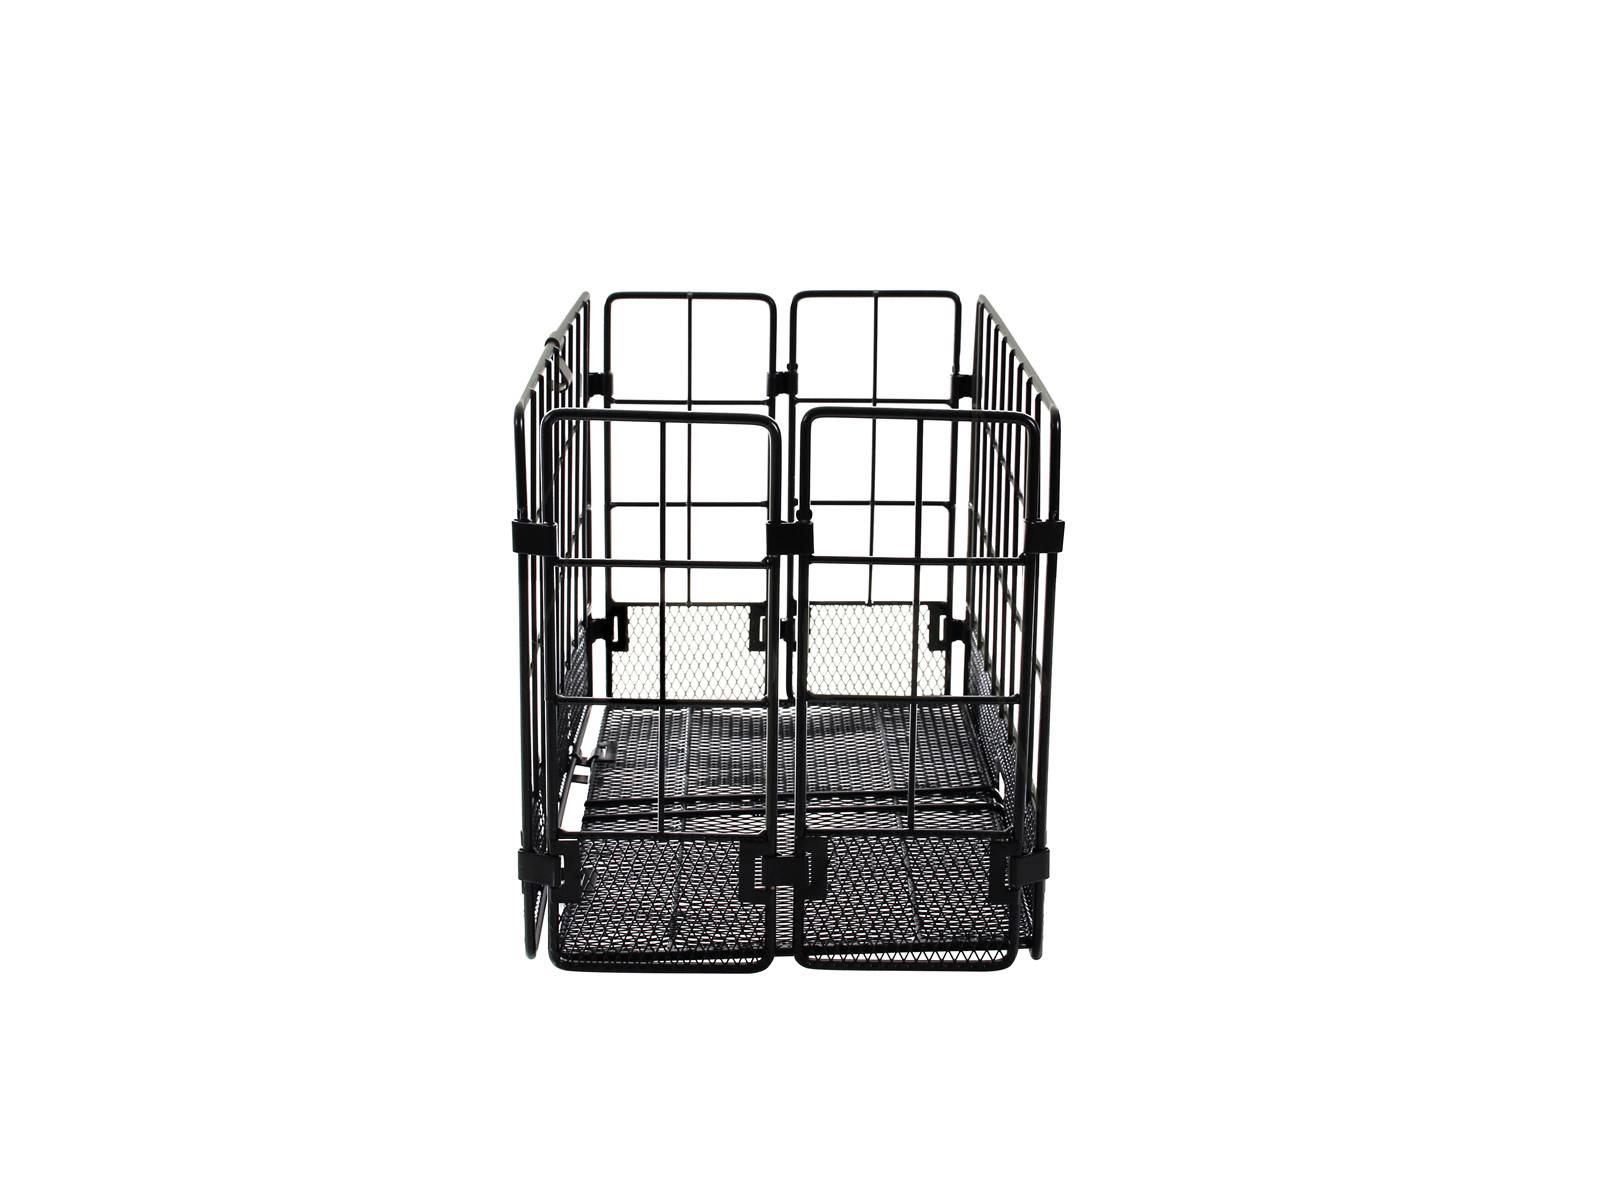 around fahrradkorb hinten klappkorb schwarz fahrradkomfort. Black Bedroom Furniture Sets. Home Design Ideas